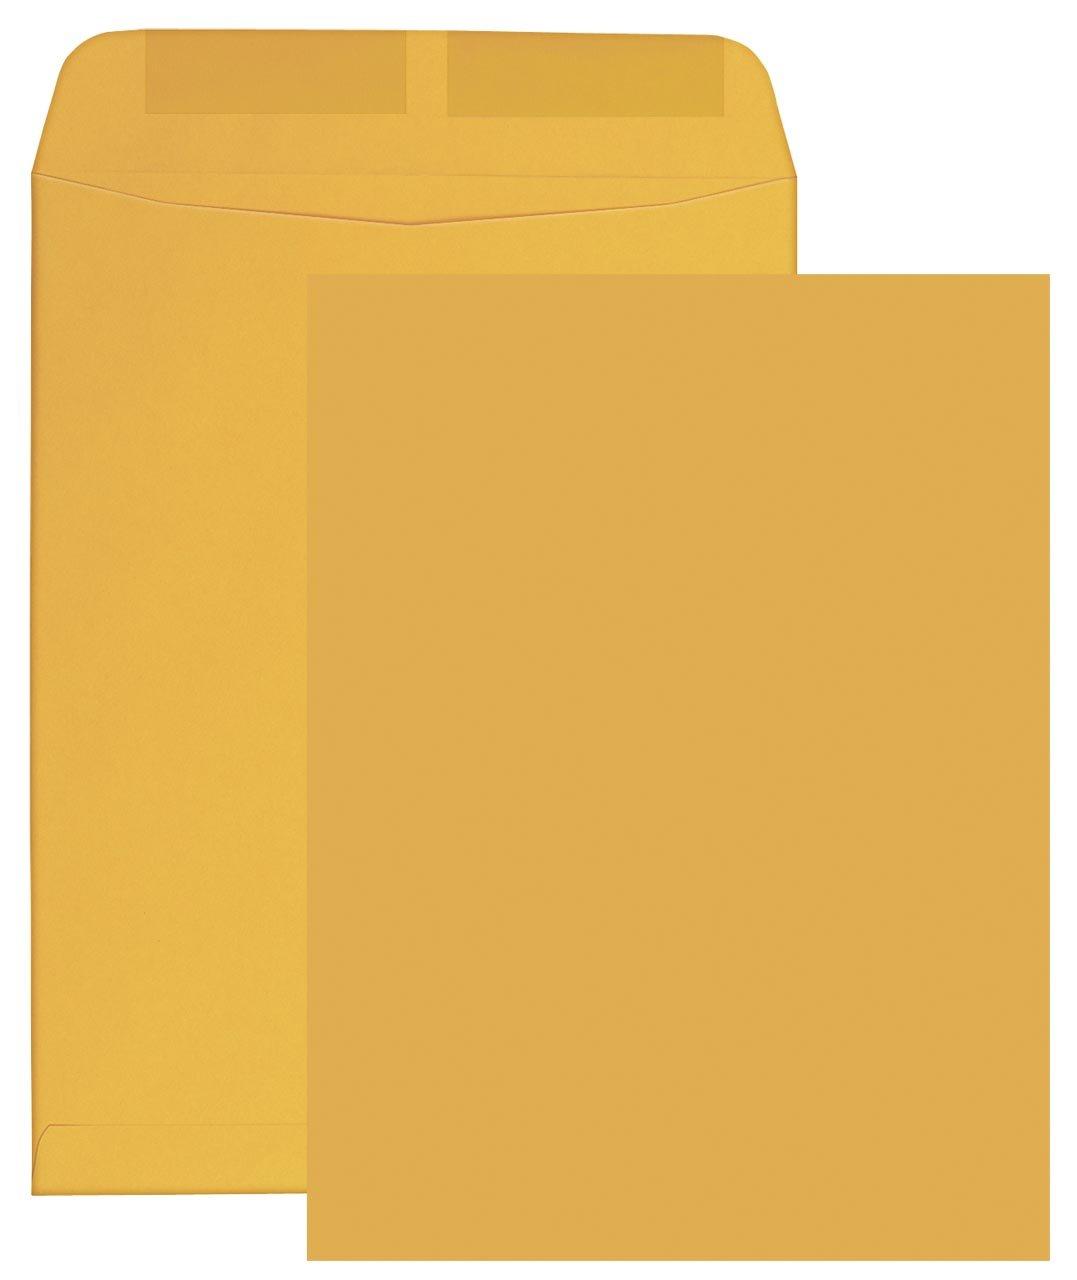 Columbian Catalog Envelopes, Gummed Seal, 6'' x 9'', Brown Kraft, 500 Per Box (CO645) by Columbian Envelopes